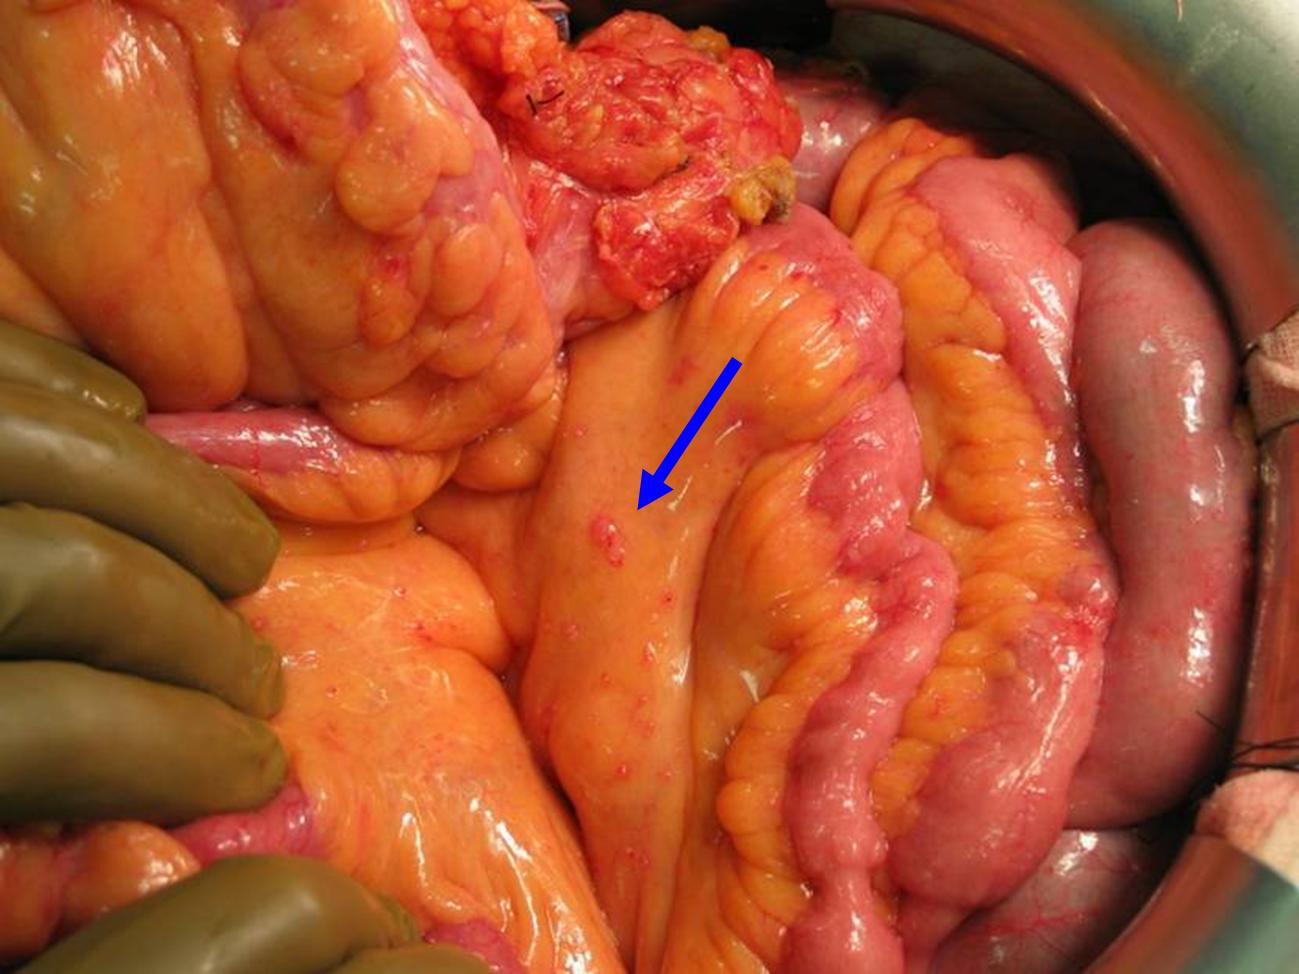 Hipec Ovhipec Pmp Peritoneal Cancer Peritoneum Seeding Seedings Metastases Hyperthermic Intraperitoneal Chemotherapy Debulking Colon Colorectal Ovarian Ovary Mesothelioma Pseudomyxoma Appendix